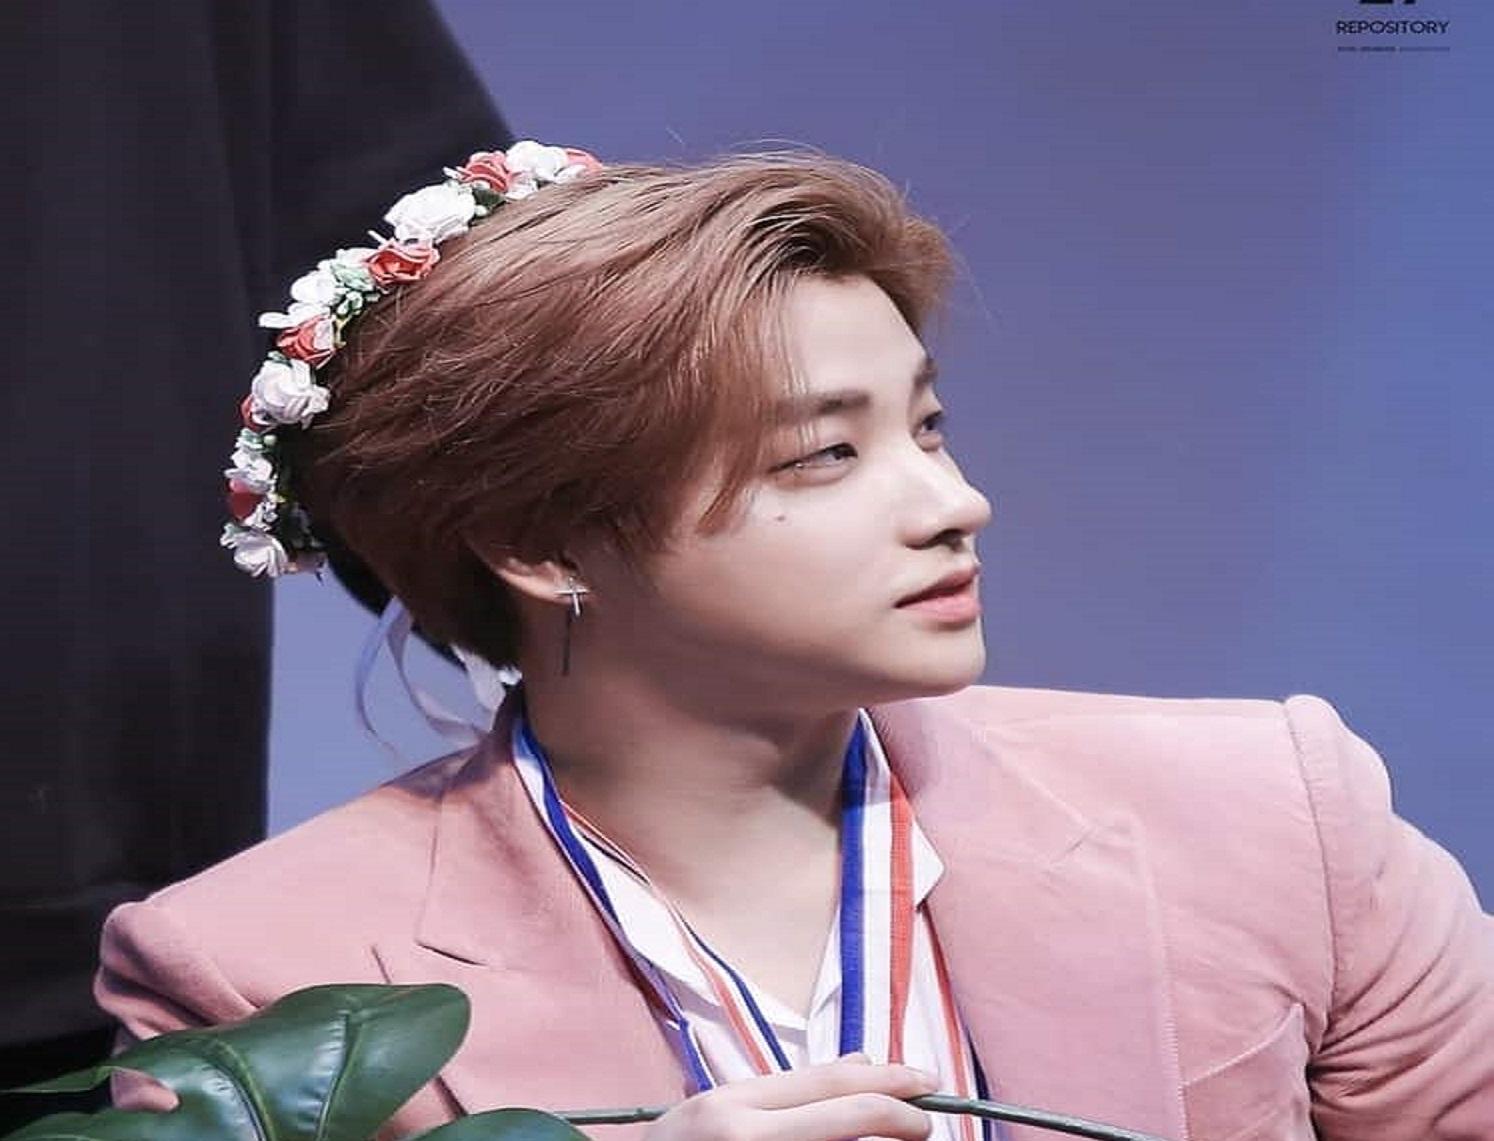 Ikon Jinhwan S New Hairstyle Surprises K Pop Fans Ulzzang